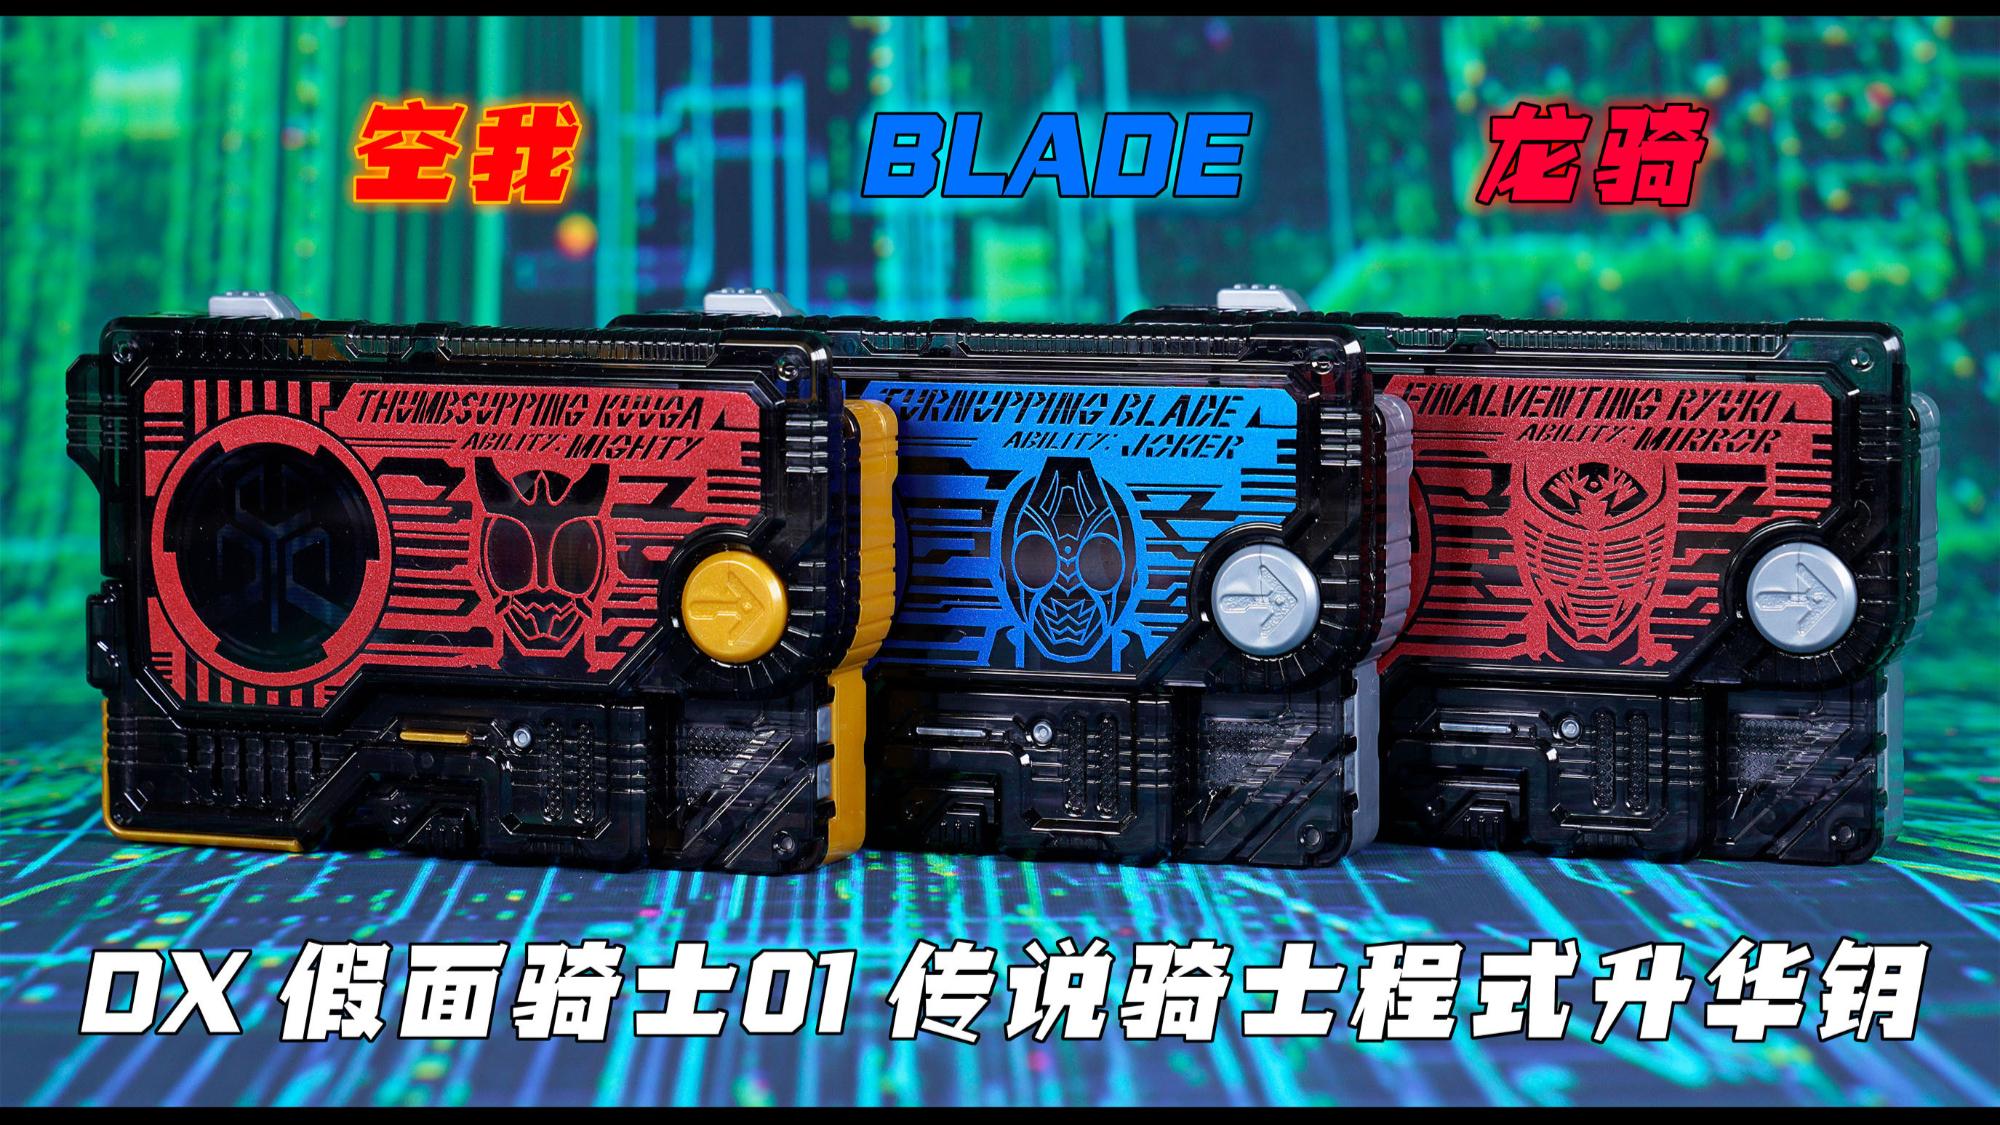 DX 假面骑士01 传说骑士程式升华钥(空我、龙骑、BLADE)